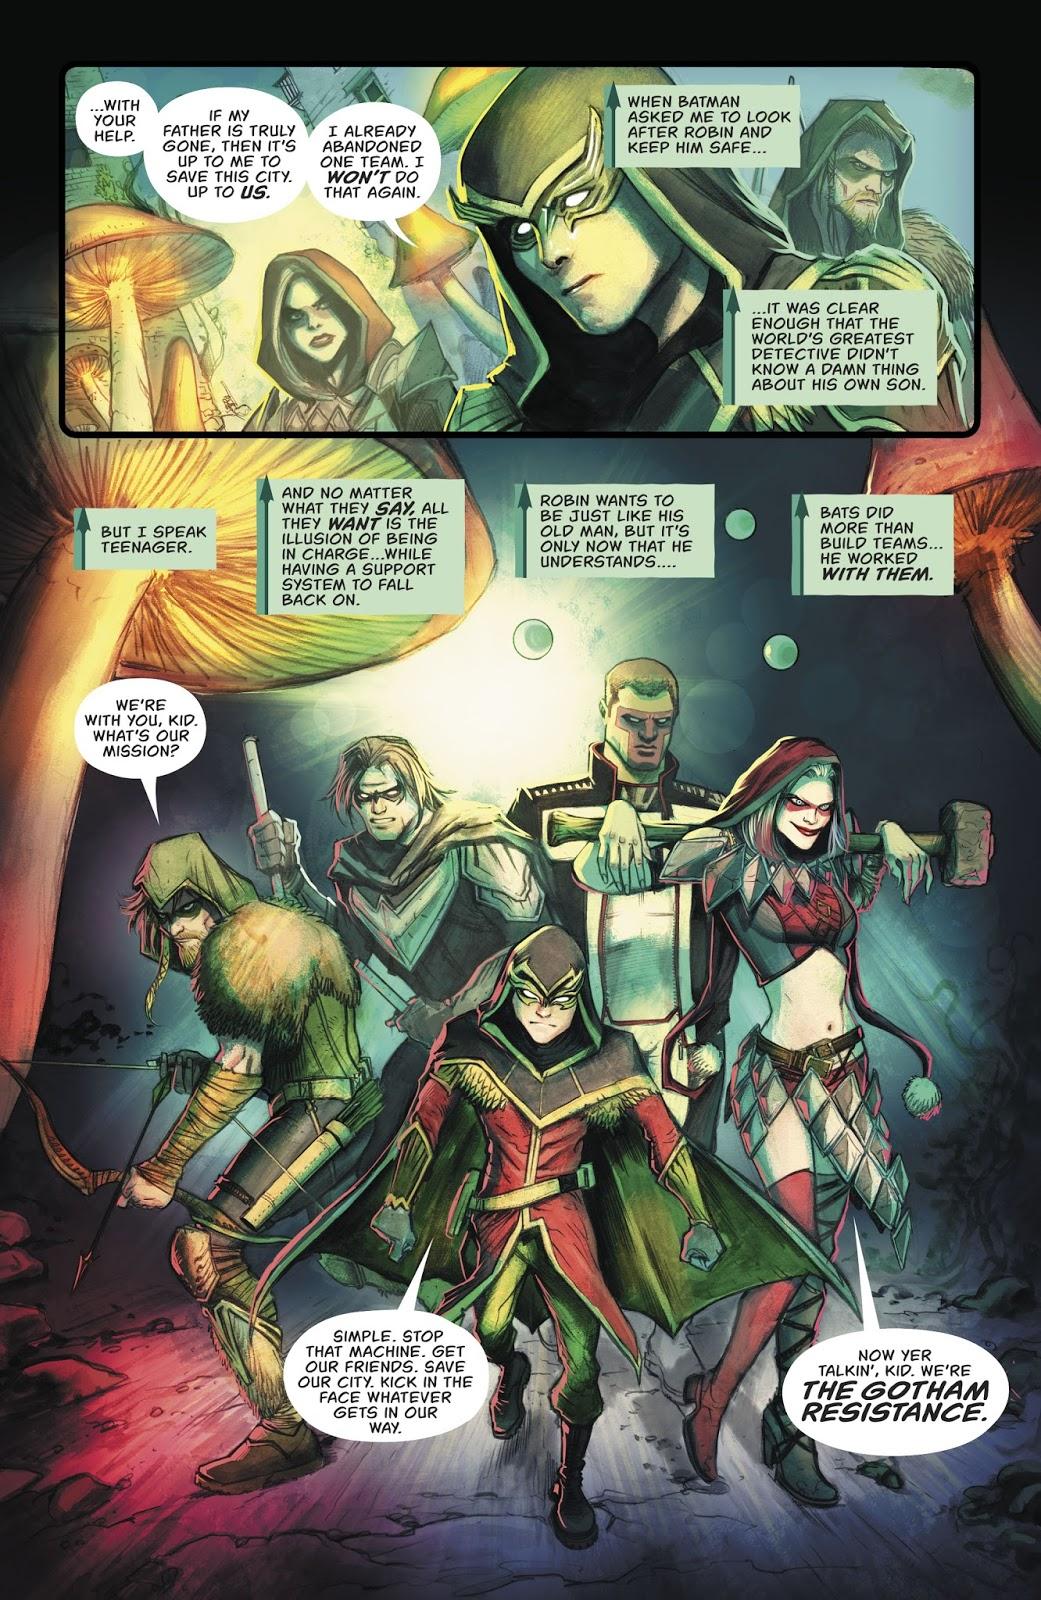 The Gotham Resistance (Green Arrow Vol 3 #32)